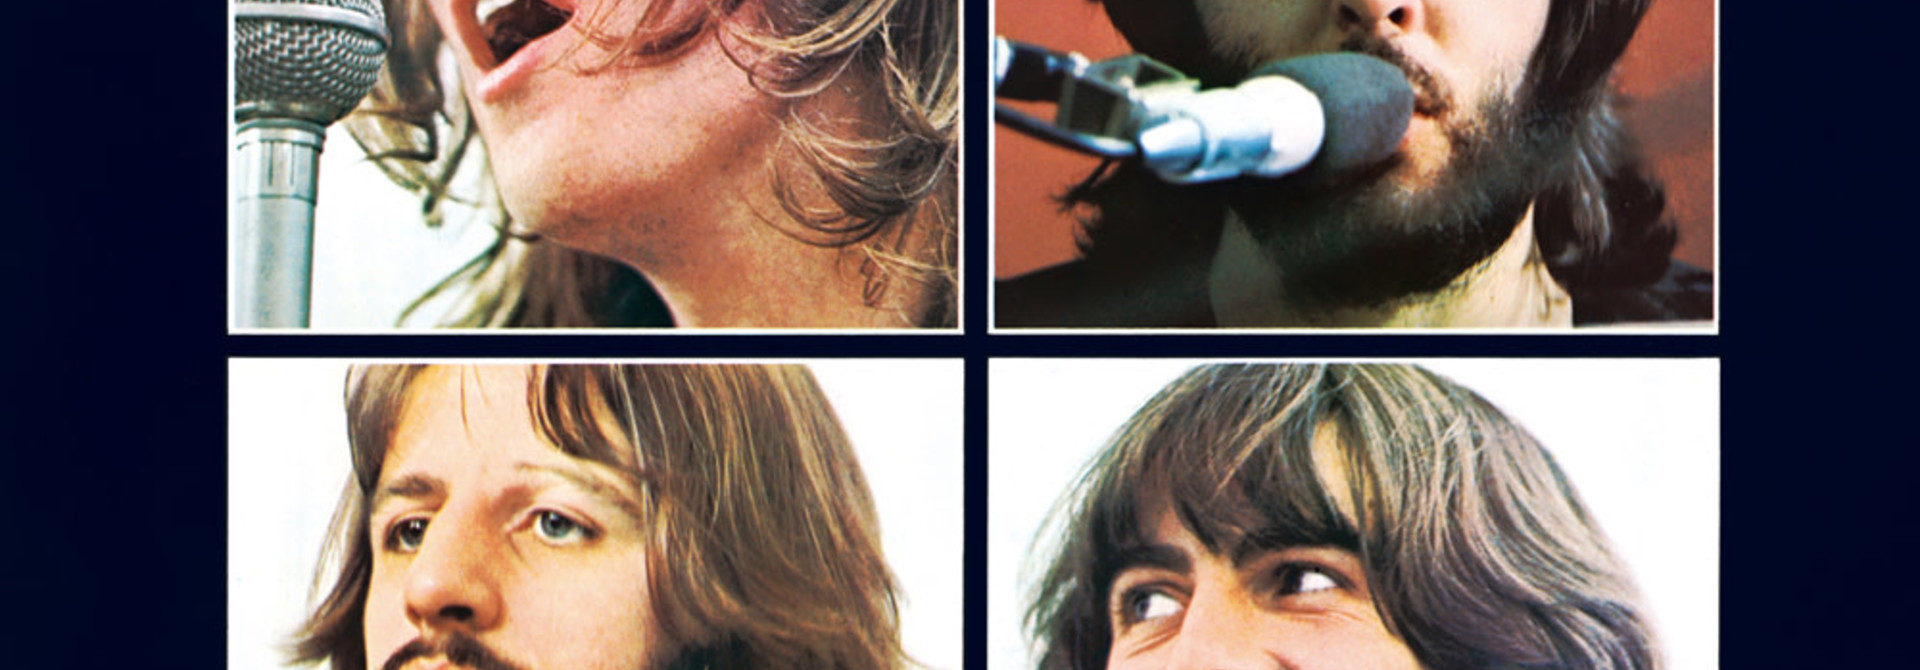 Beatles • Let It Be (180g)